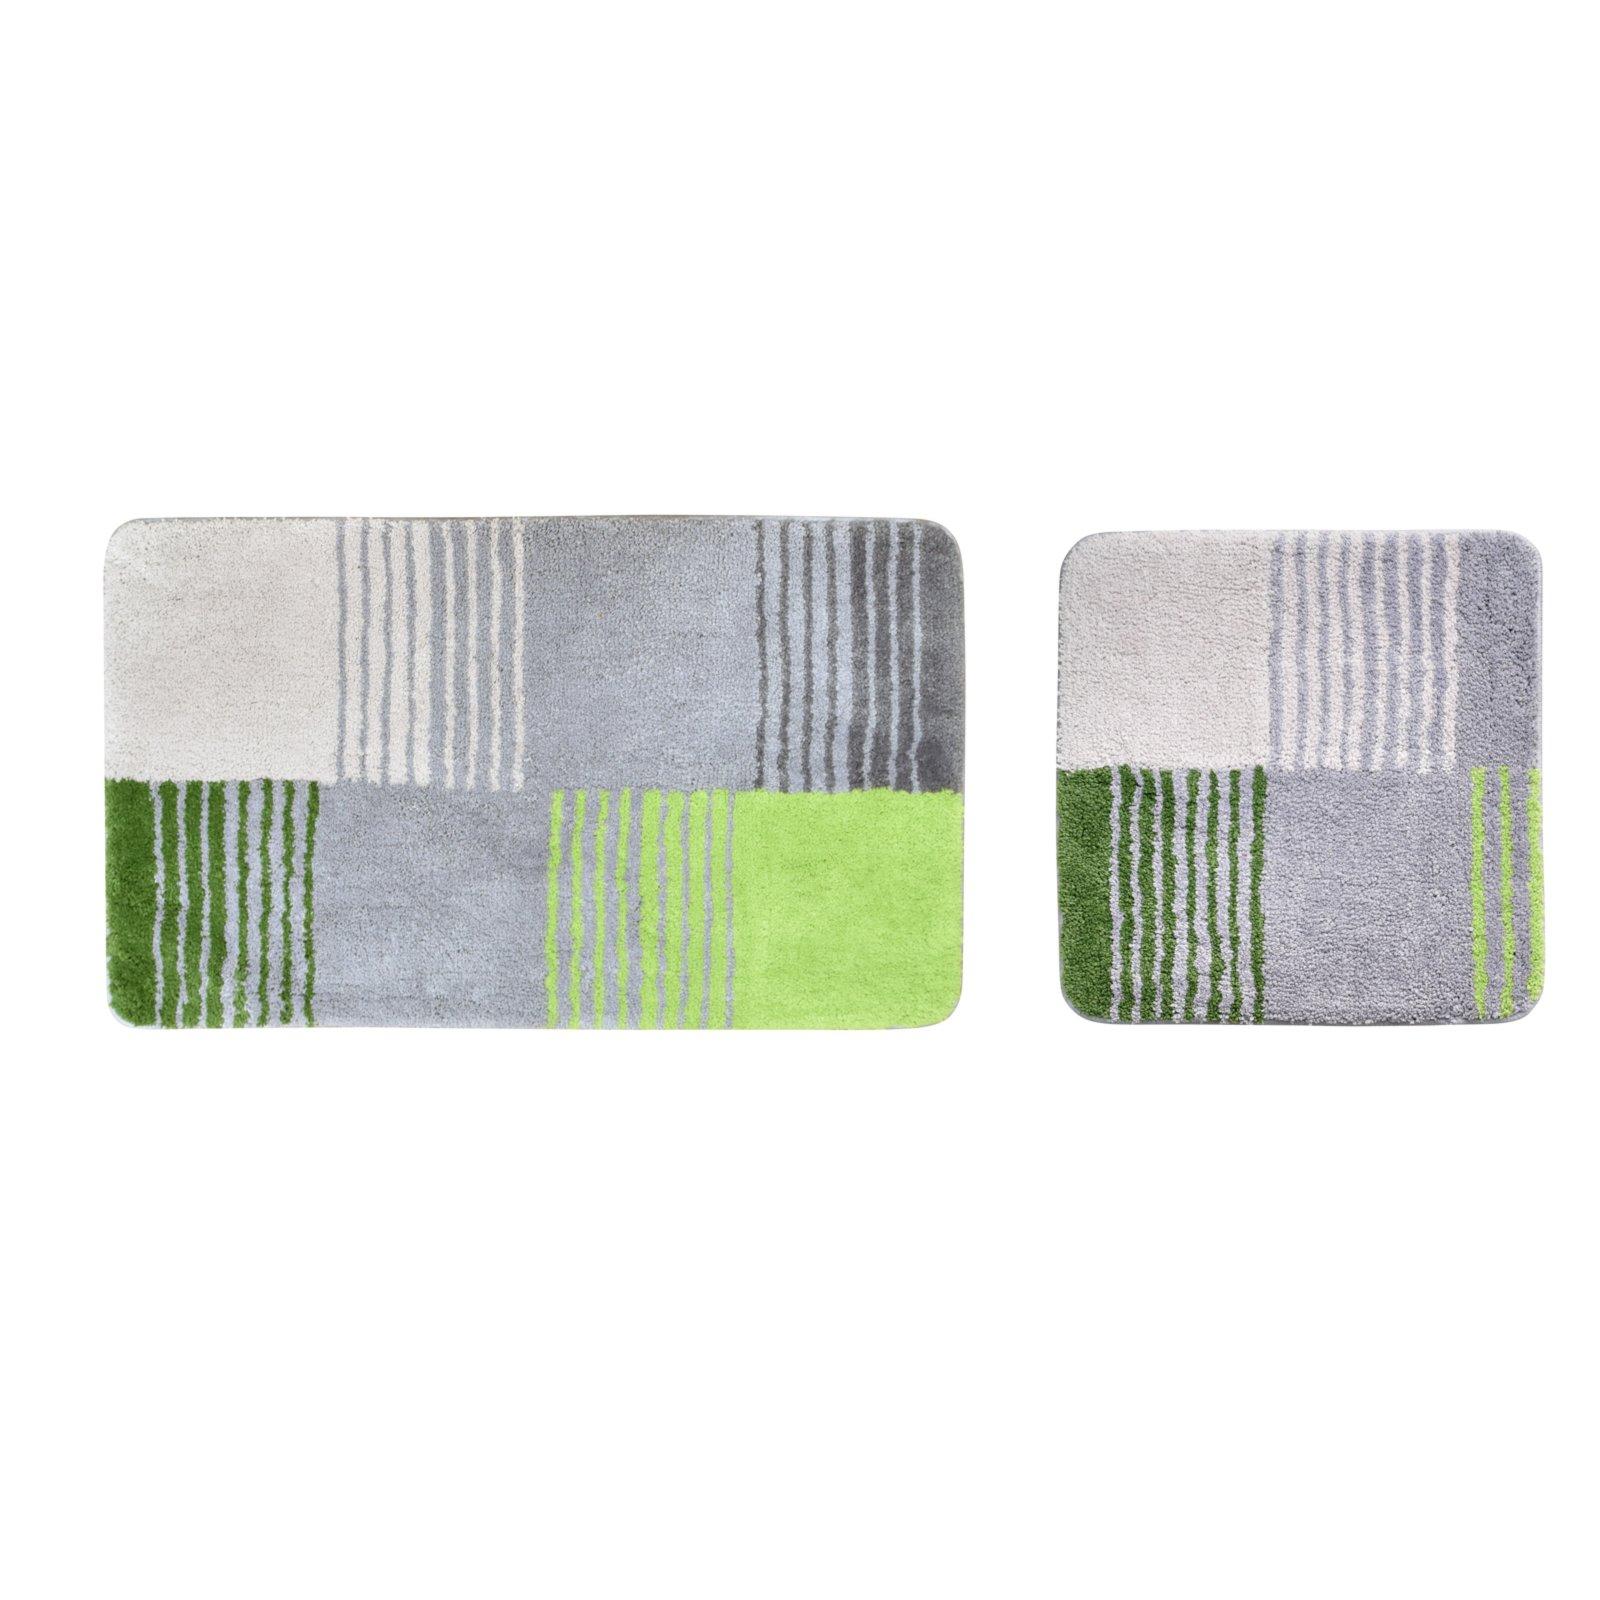 badgarnitur toledo gr n grau 2 teilig badteppiche matten badtextilien heimtextilien. Black Bedroom Furniture Sets. Home Design Ideas